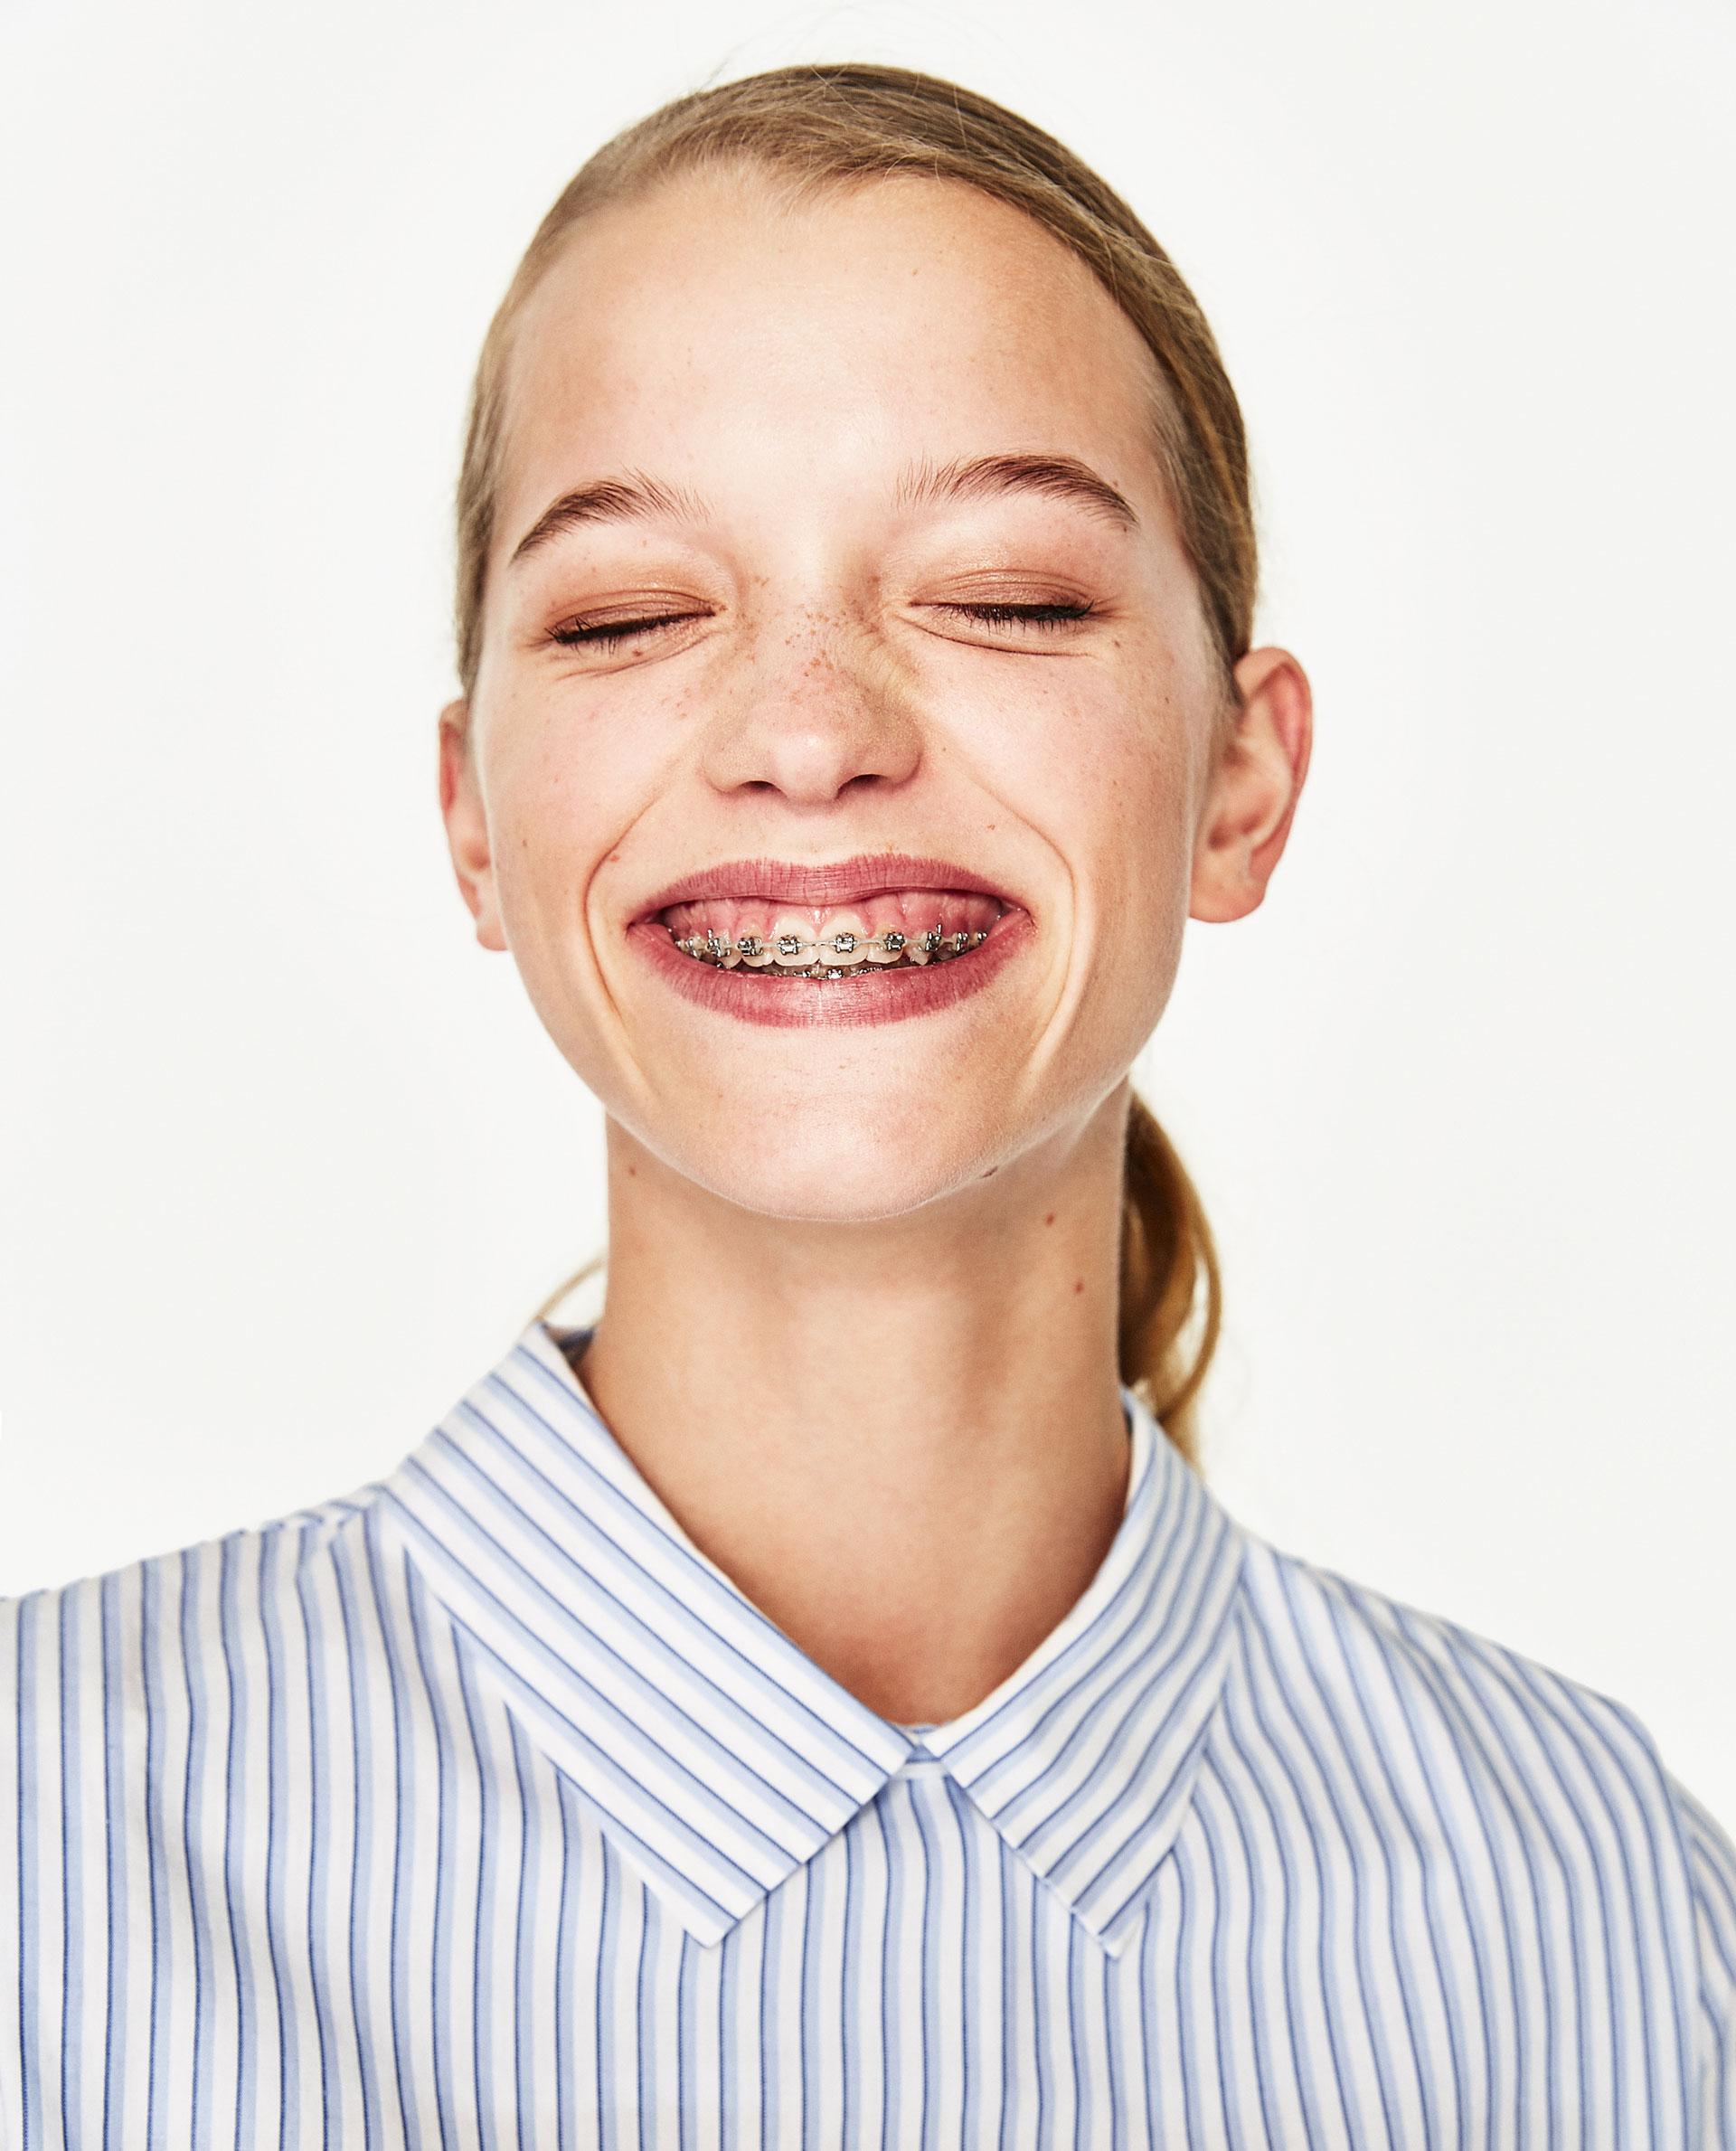 modelos zara ortodoncia